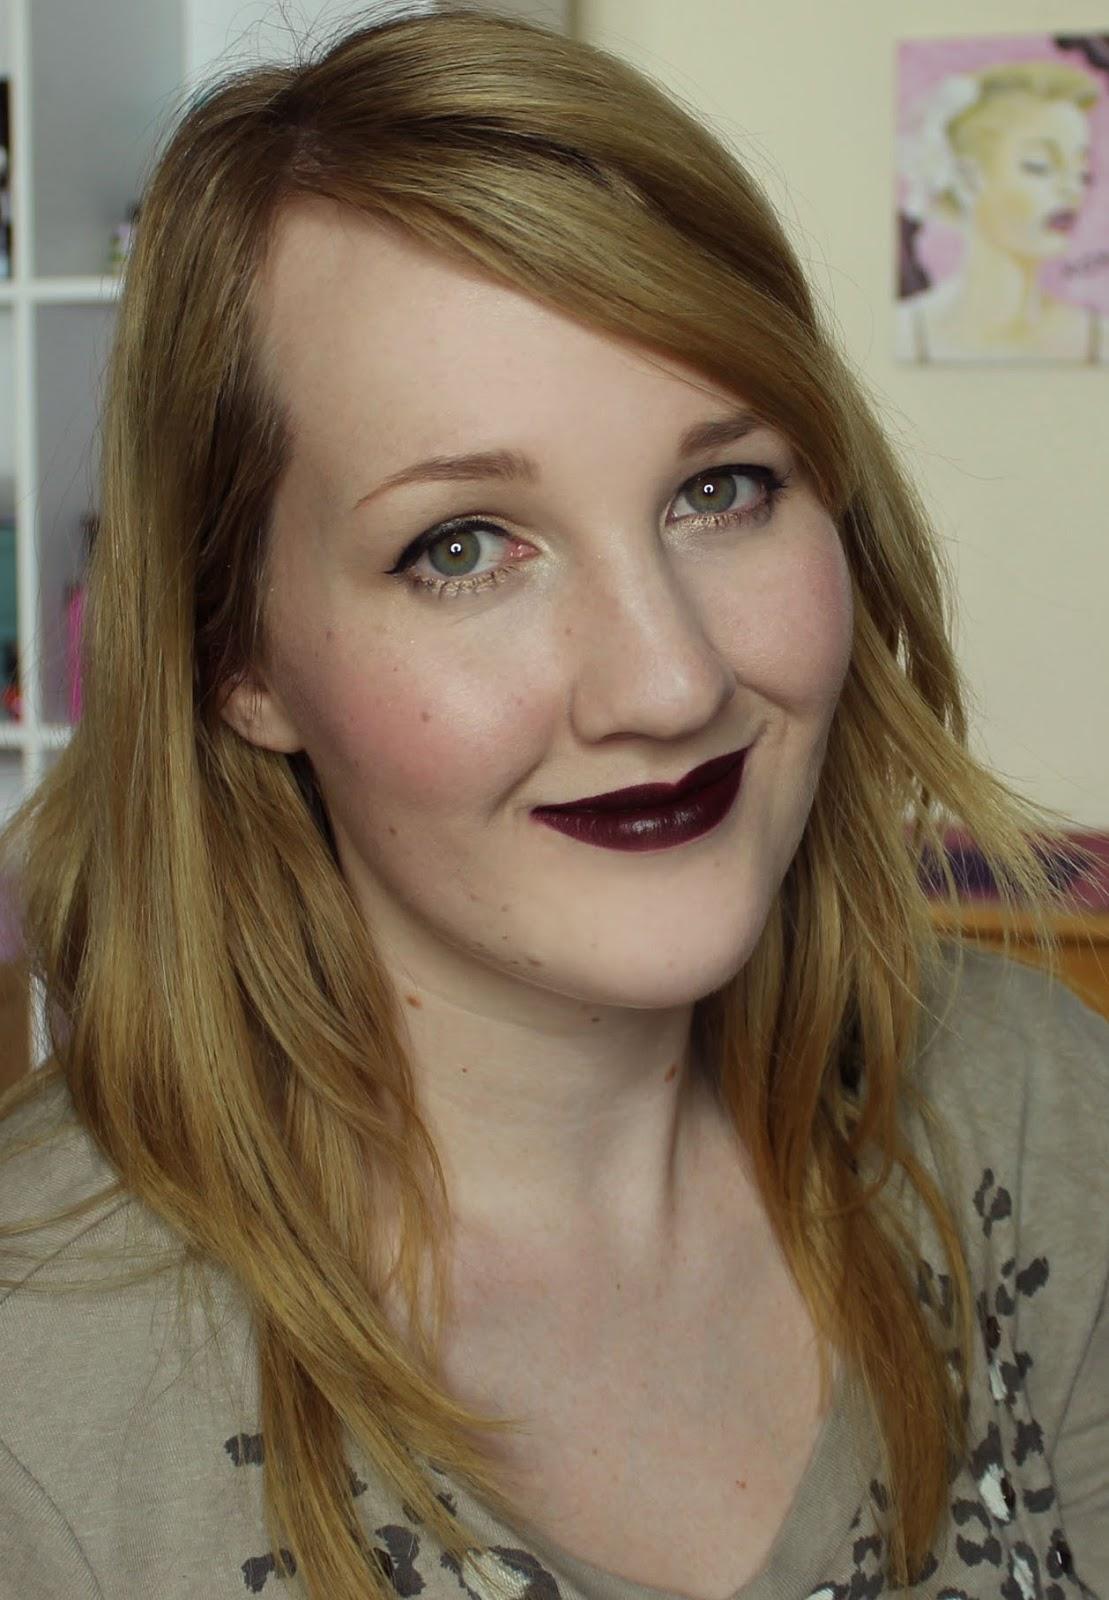 MAC Living Legend Lipstick Swatches & Review